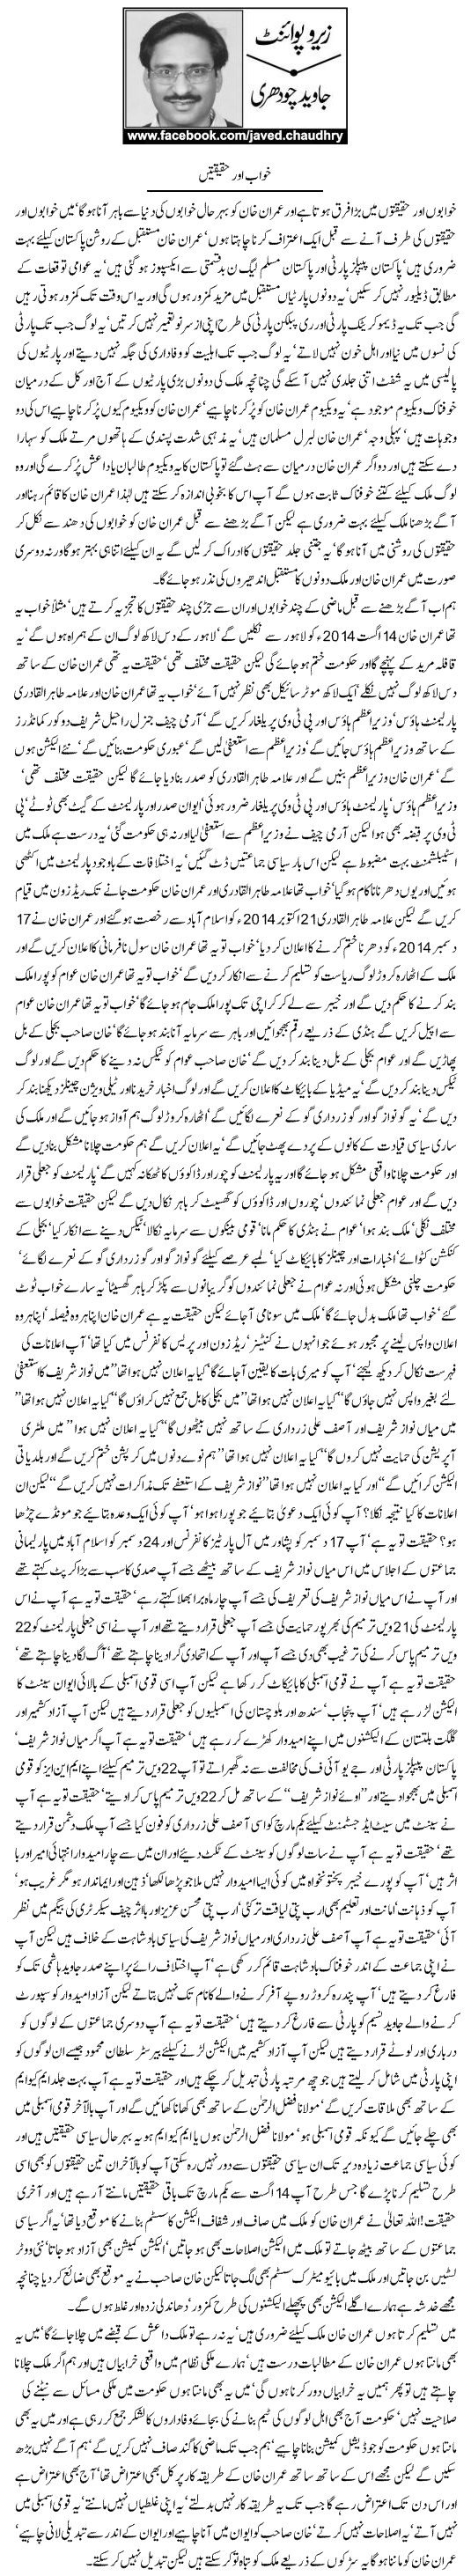 Khwab aur Haqiqatien By Javed Chaudhry - Pakfunny